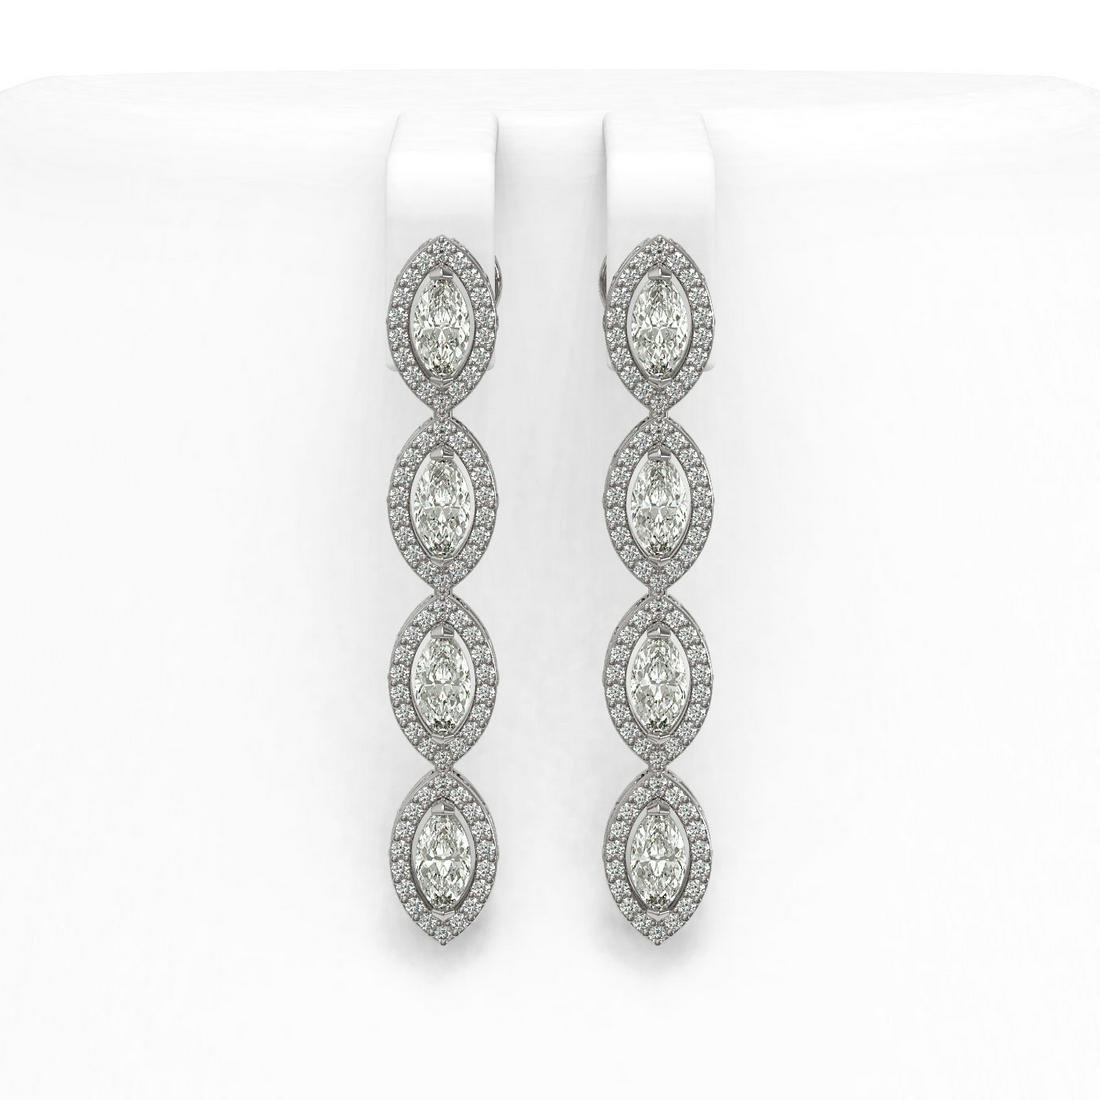 4.52 ctw Marquise Diamond Earrings 18K White Gold -